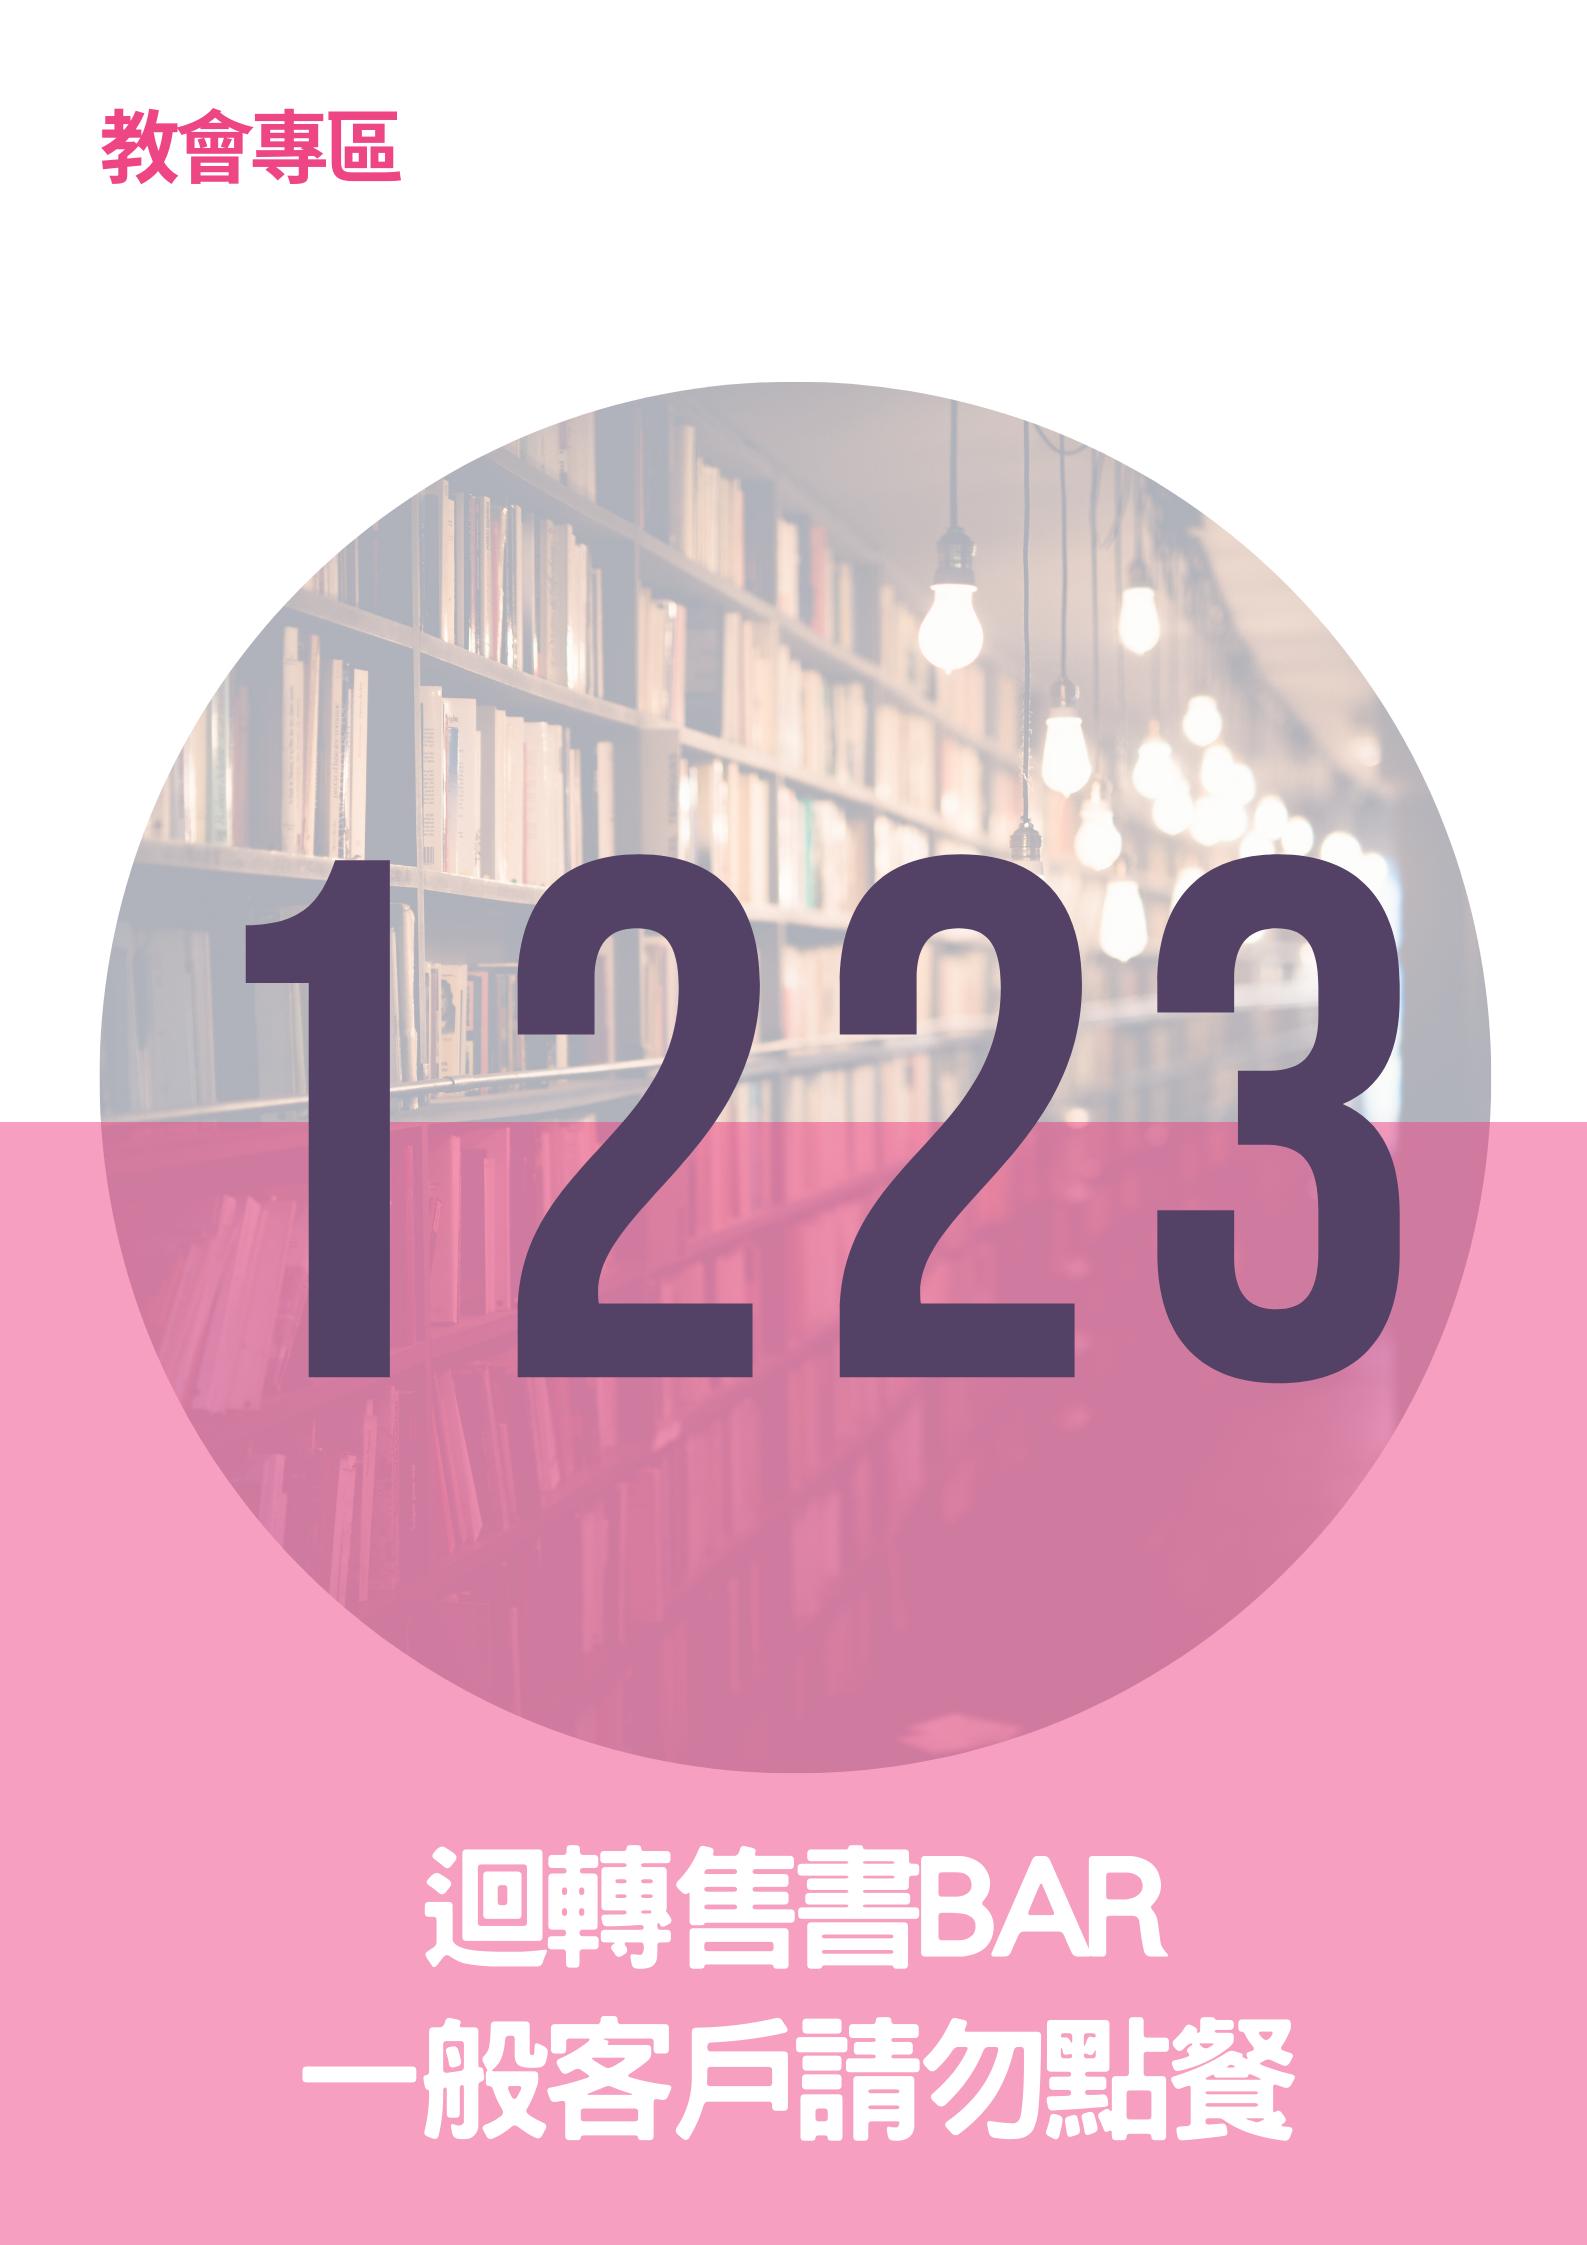 17296213